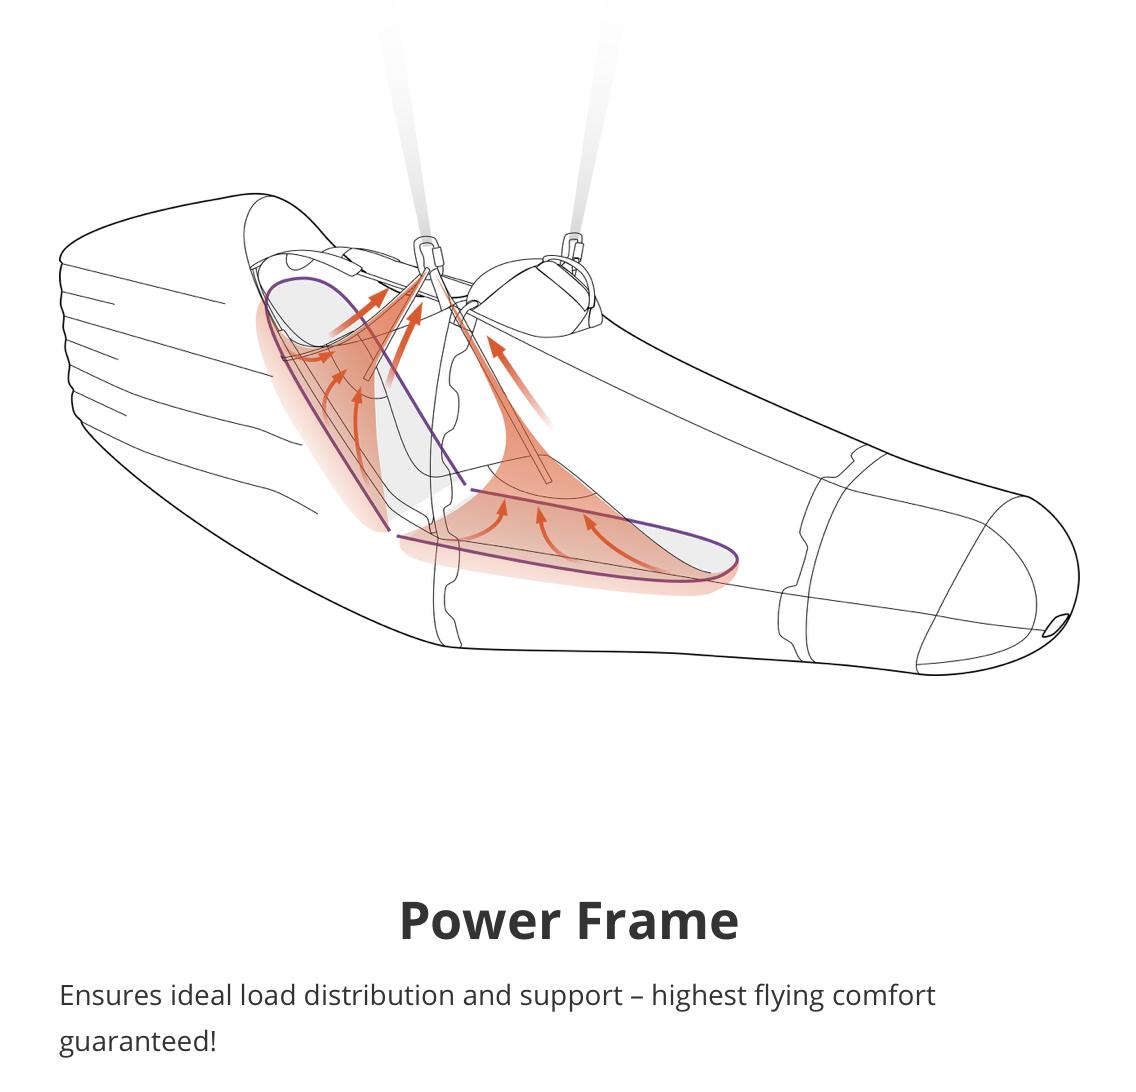 Skywalk Range X-Alps 2 - Power Frame